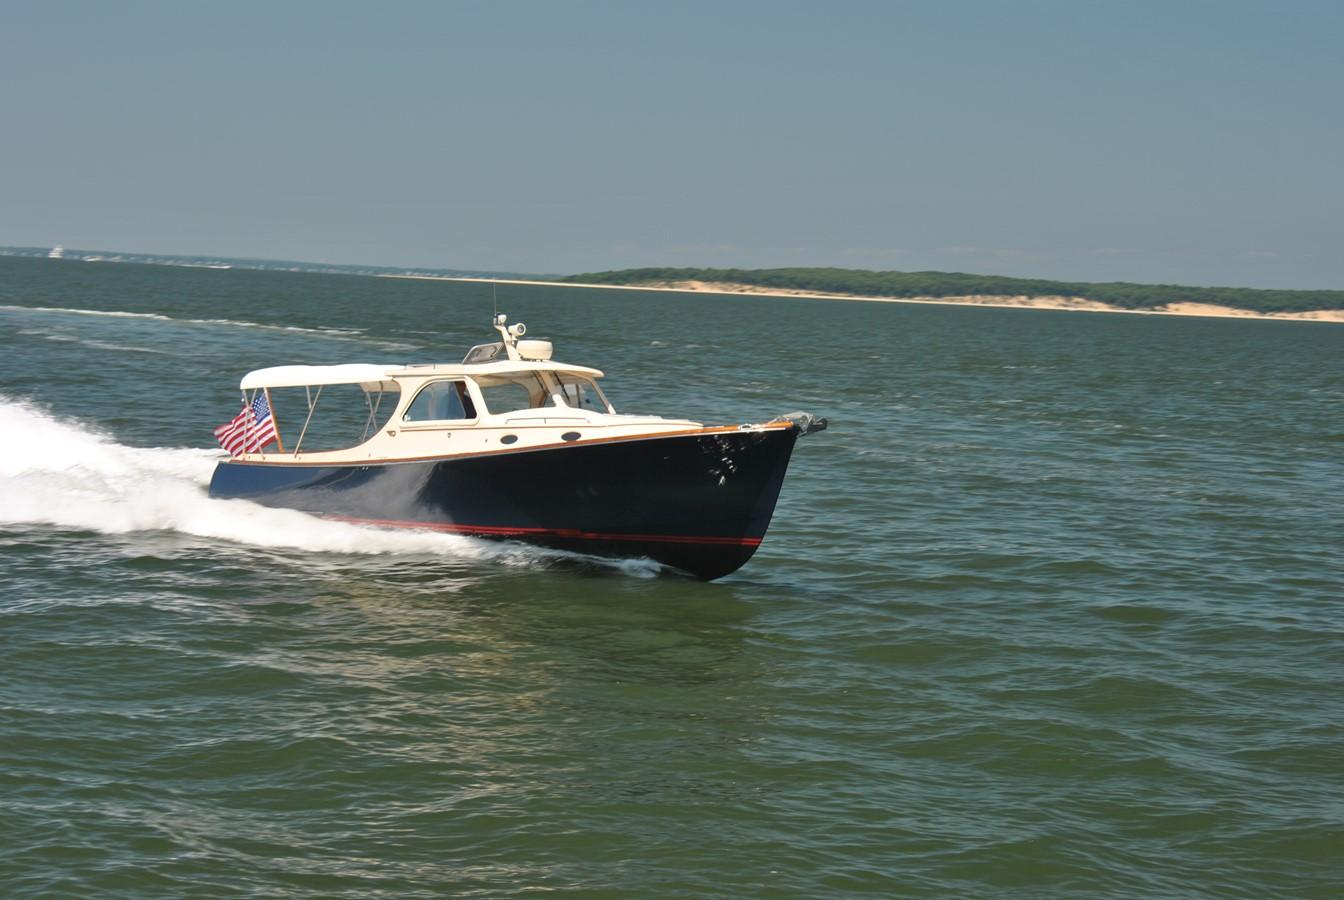 Cruising Speed 1 1996 HINCKLEY Picnic Boat Motor Yacht 2604790